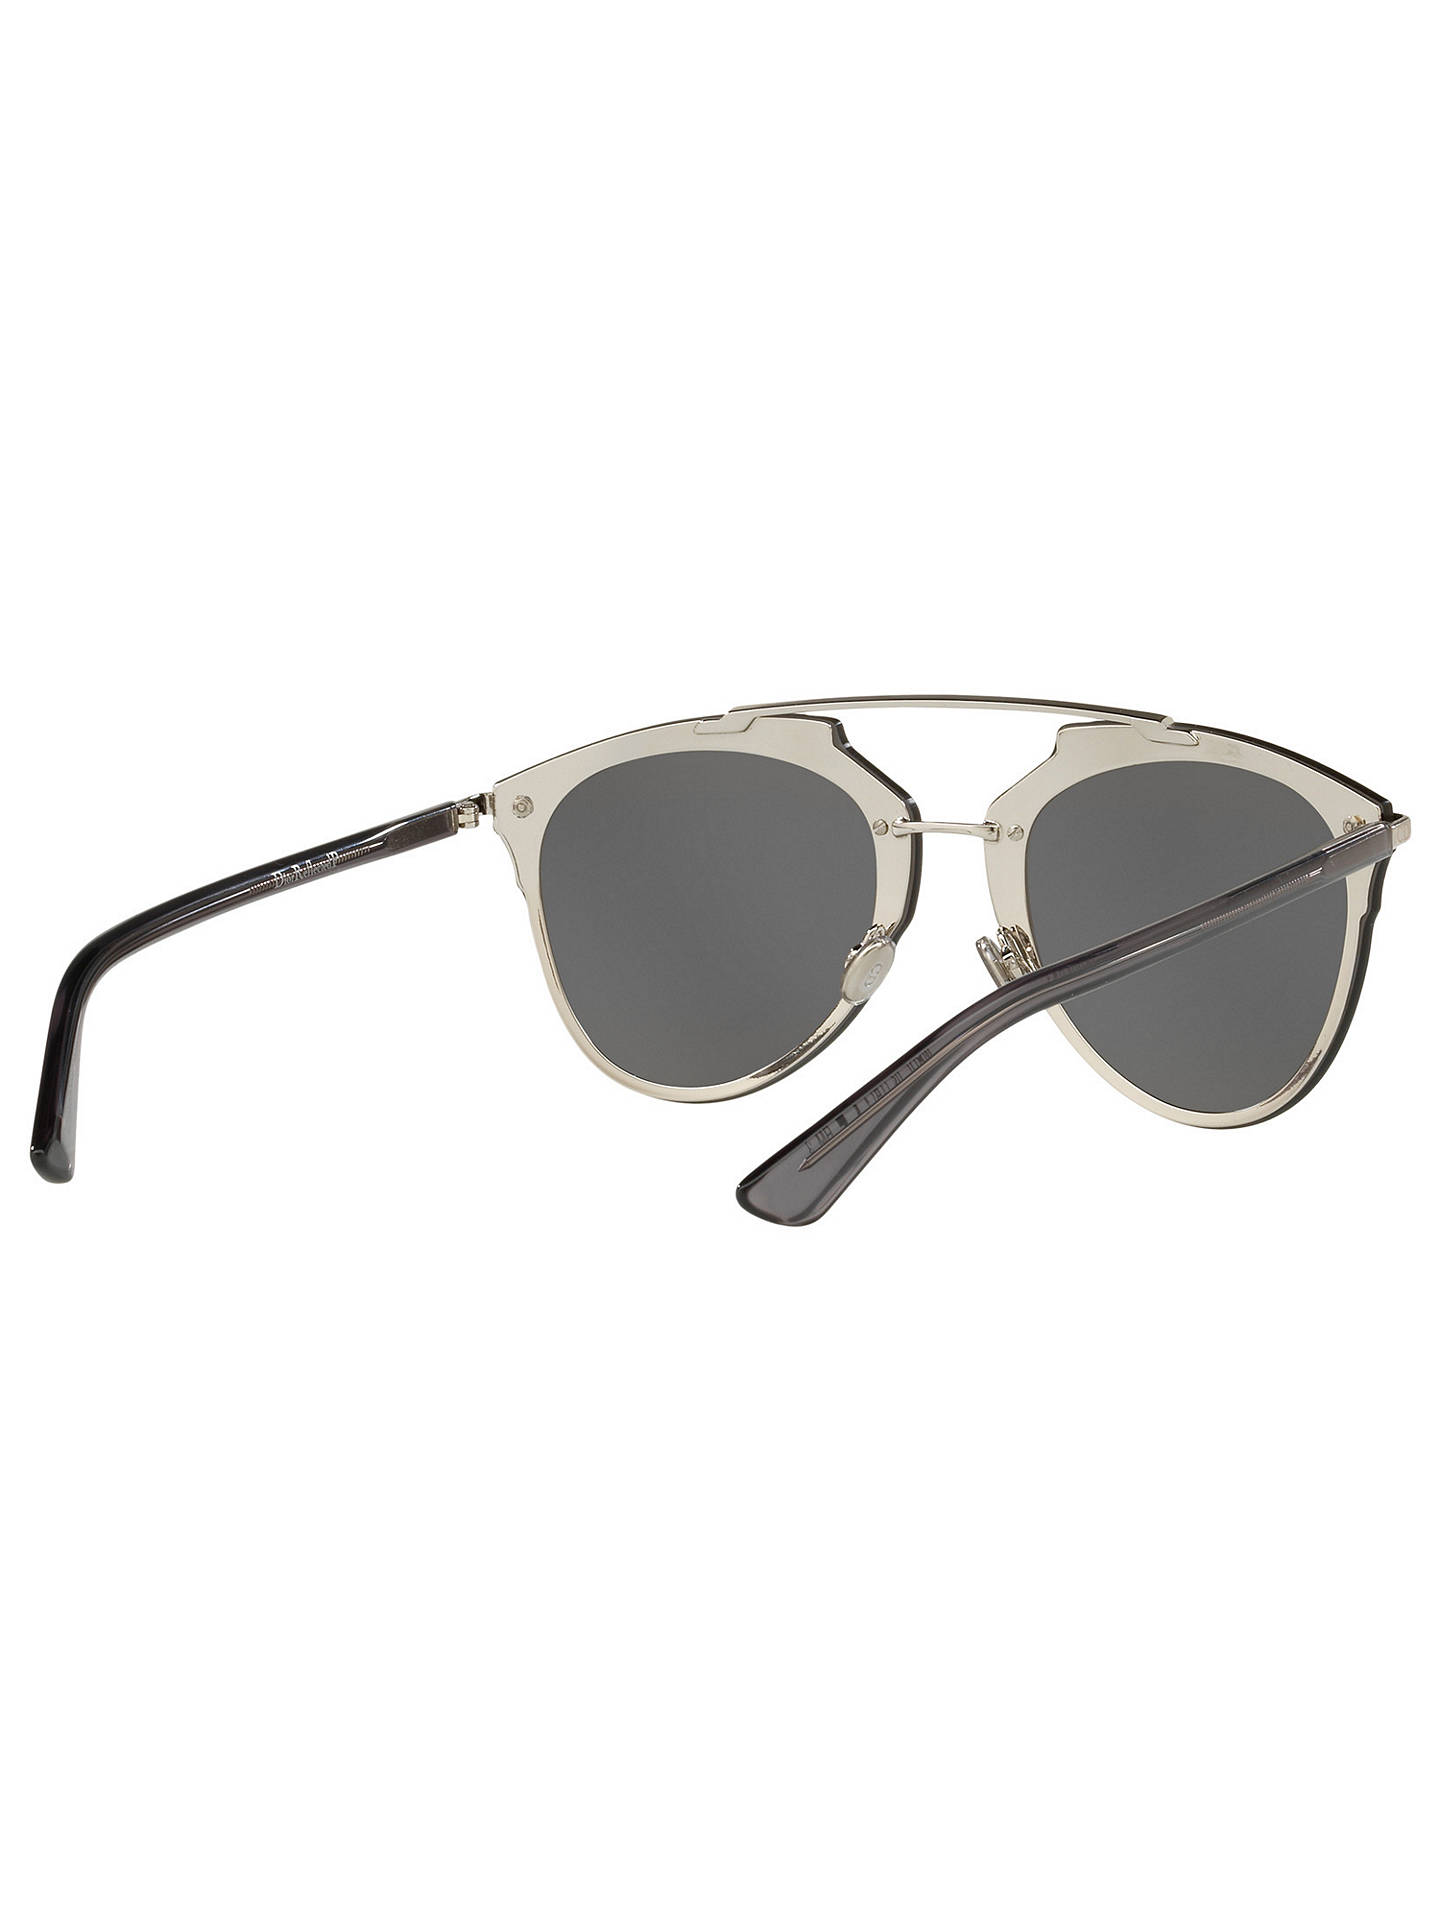 1e0c30d9f6bf Buy Dior J Adior Polarised Oval Sunglasses